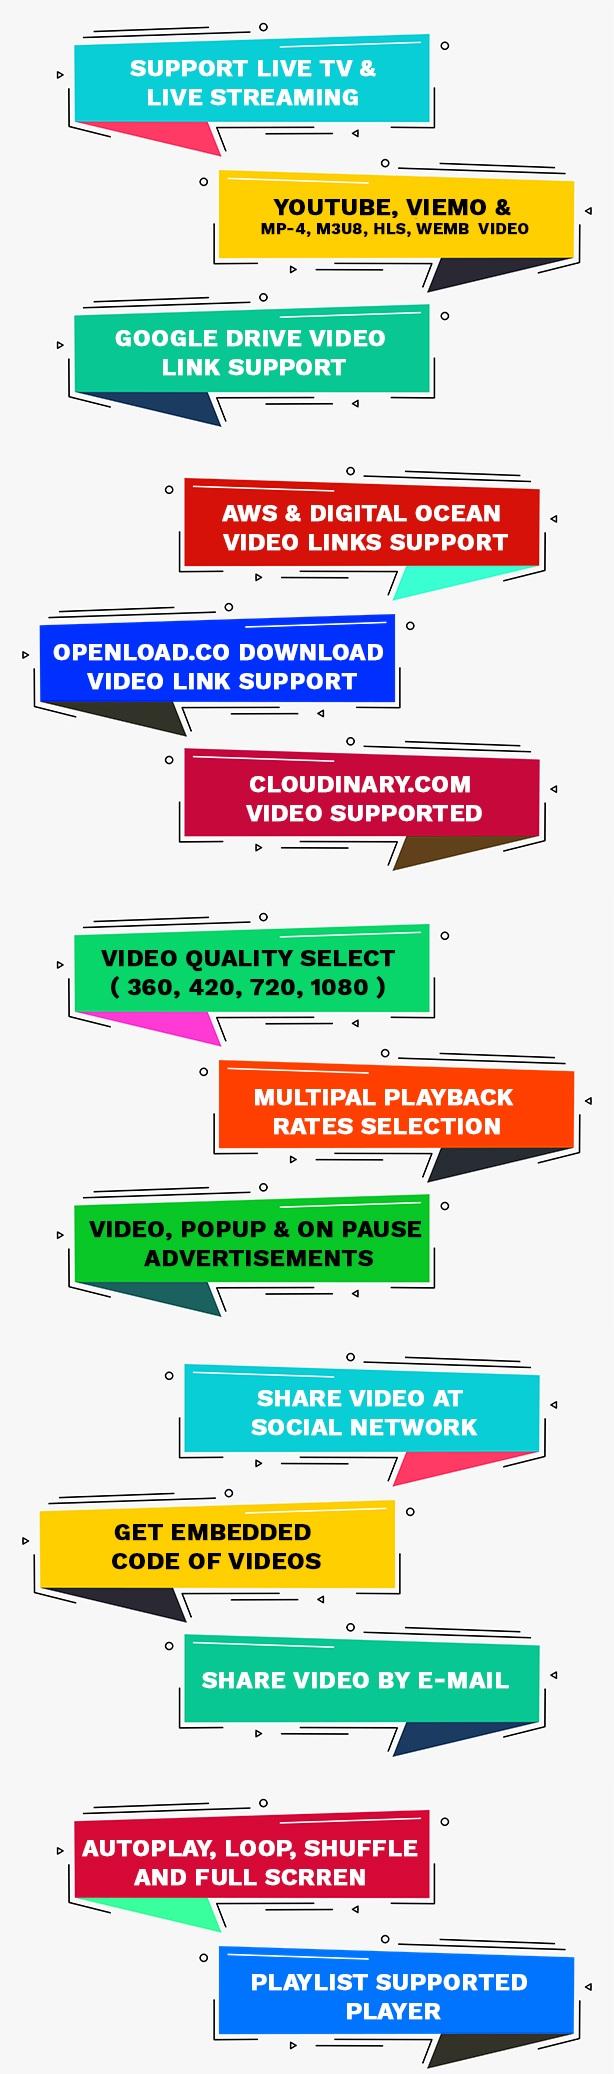 Next Hour - Movie Tv Show & Video Subscription Portal Cms Web and Mobile App - 7